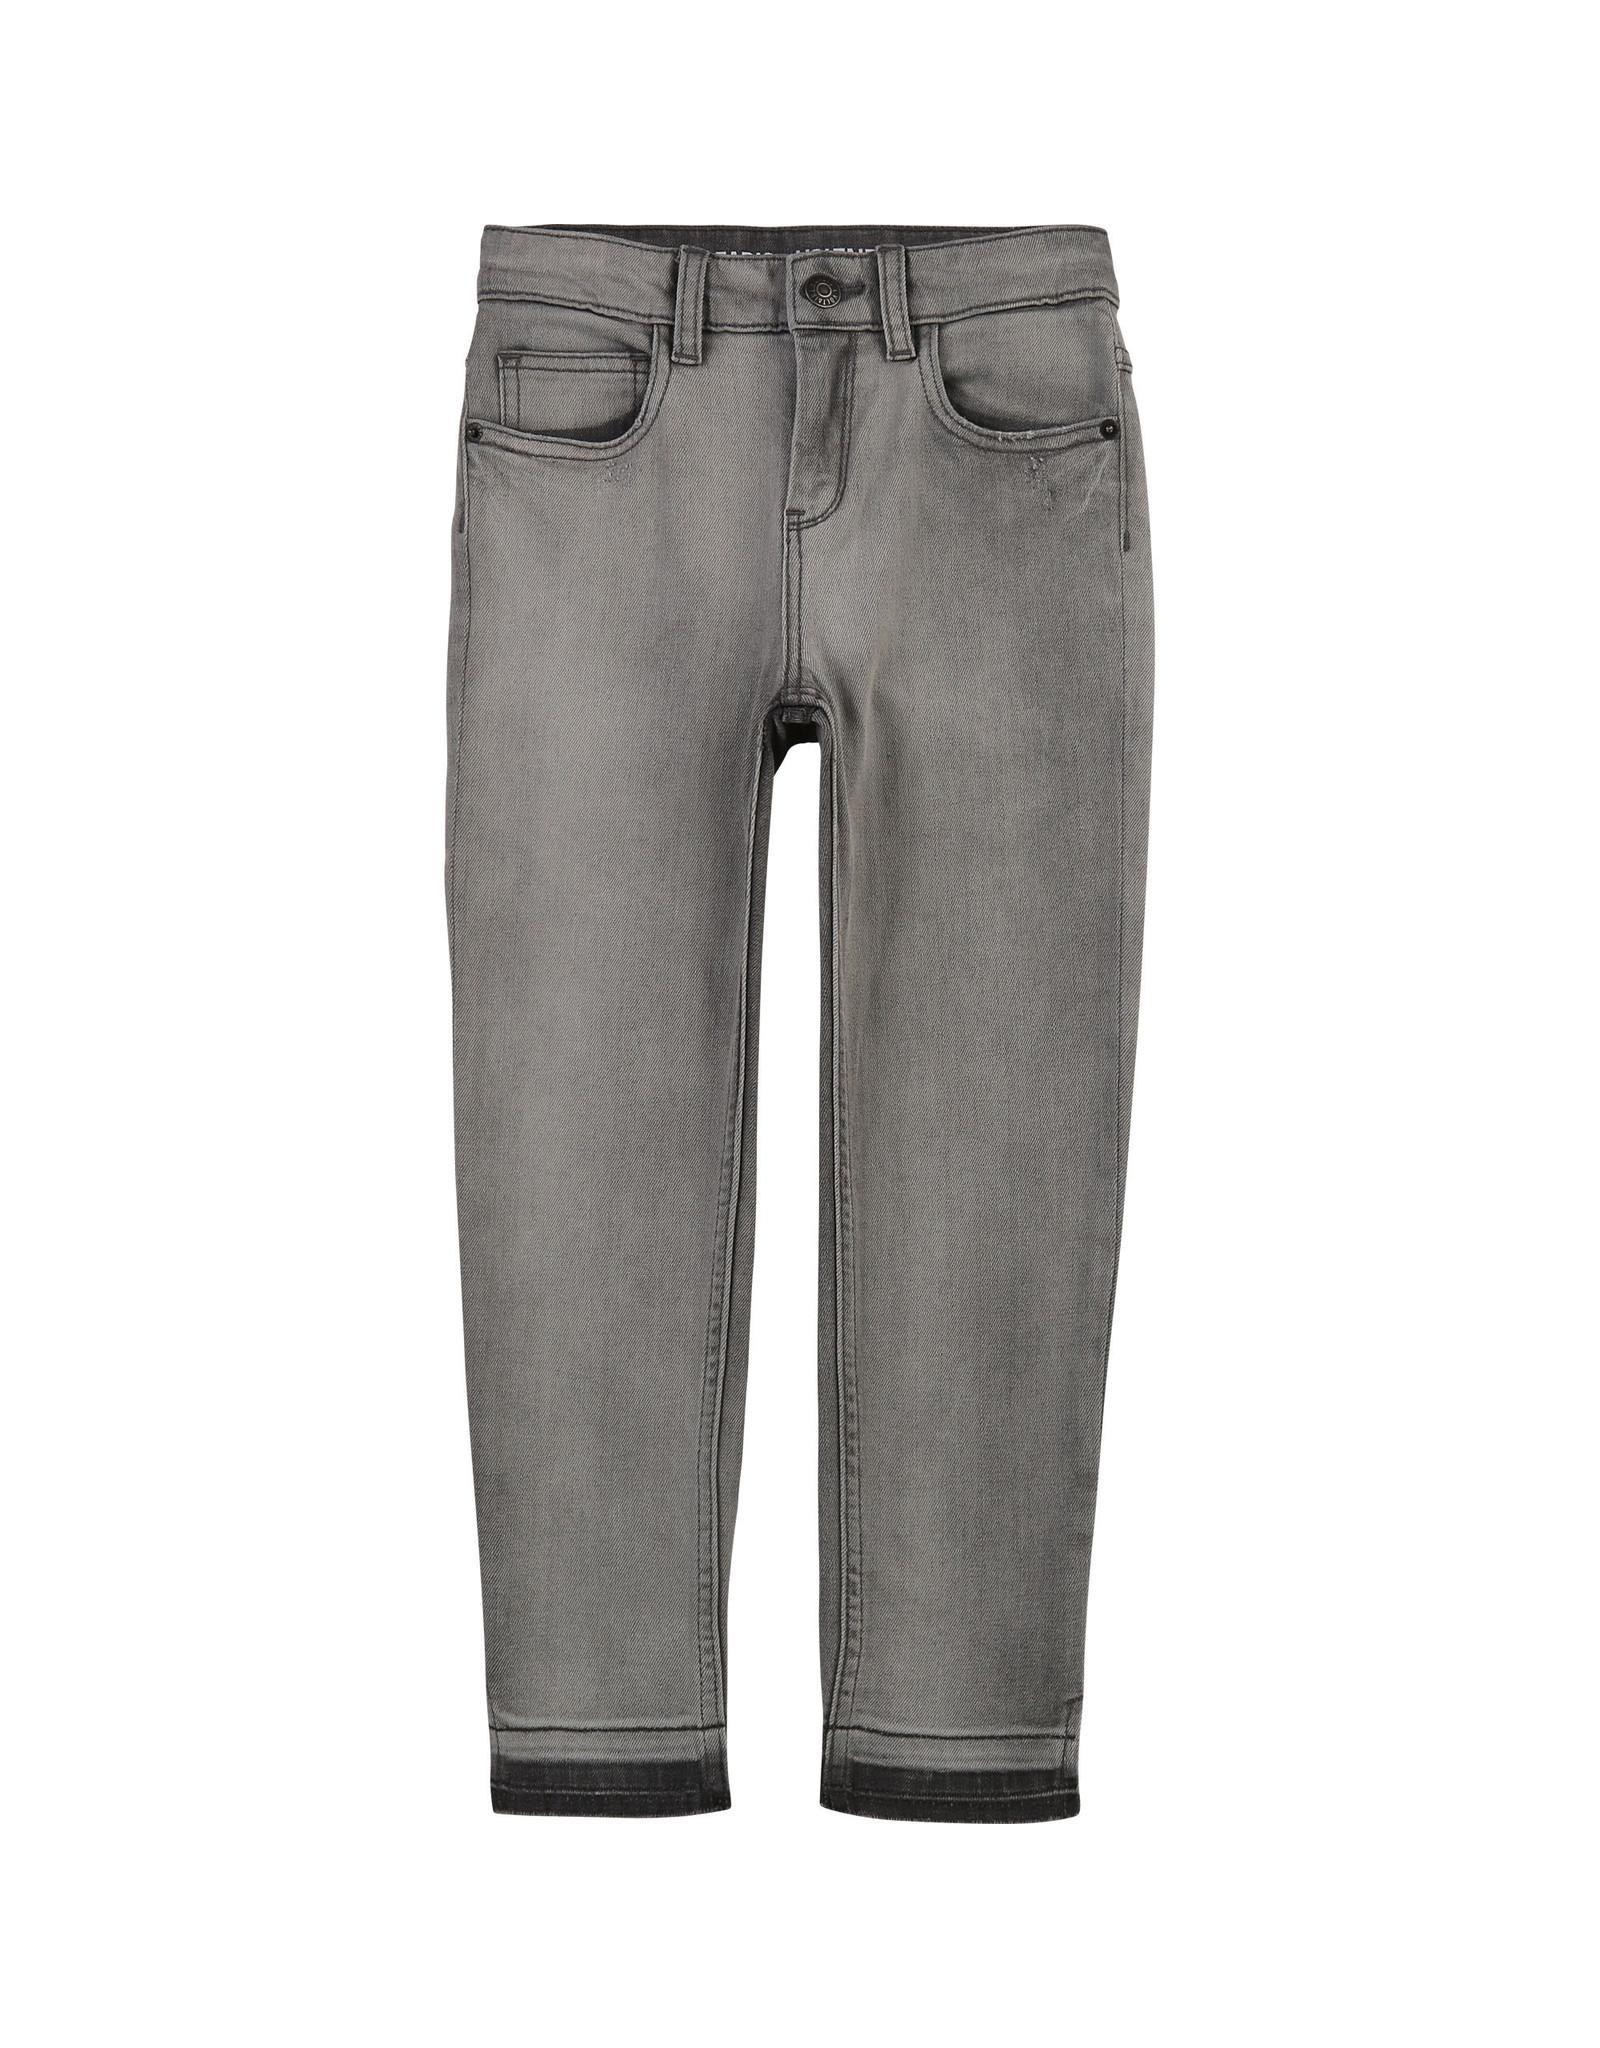 Zadig&Voltaire Z&V SS21 X14108 jeans